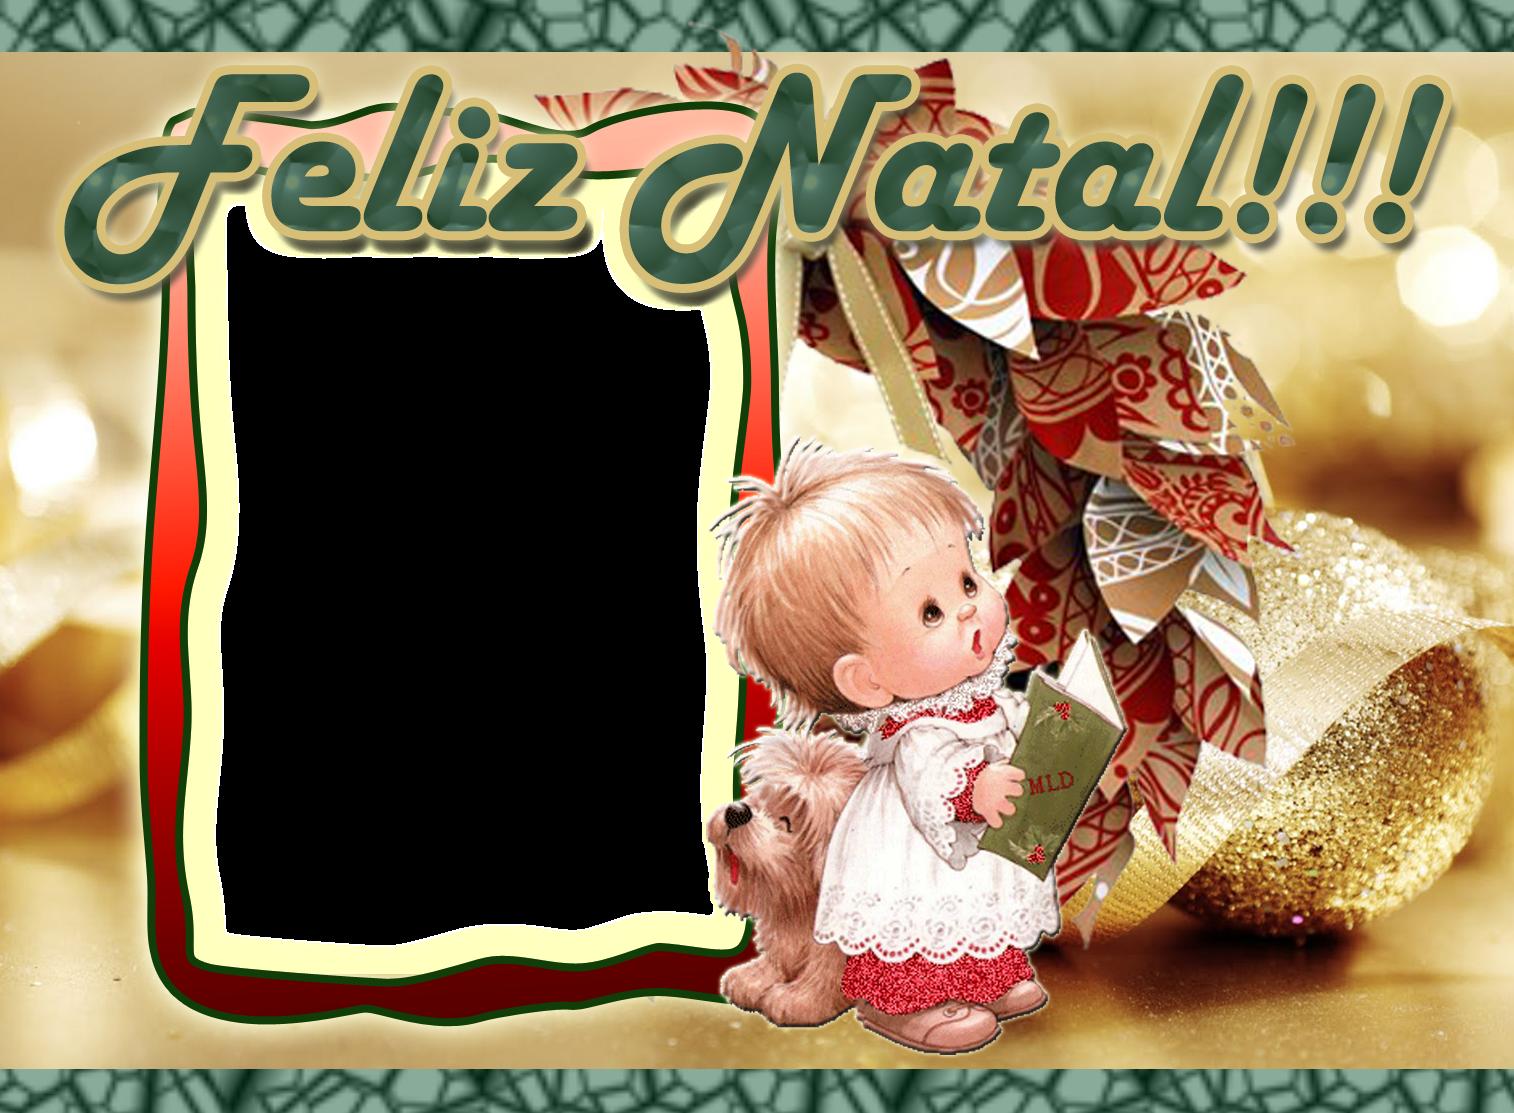 Moldura Feliz Natal   Menino Cantando  Guirlanda E Fundo Dourado